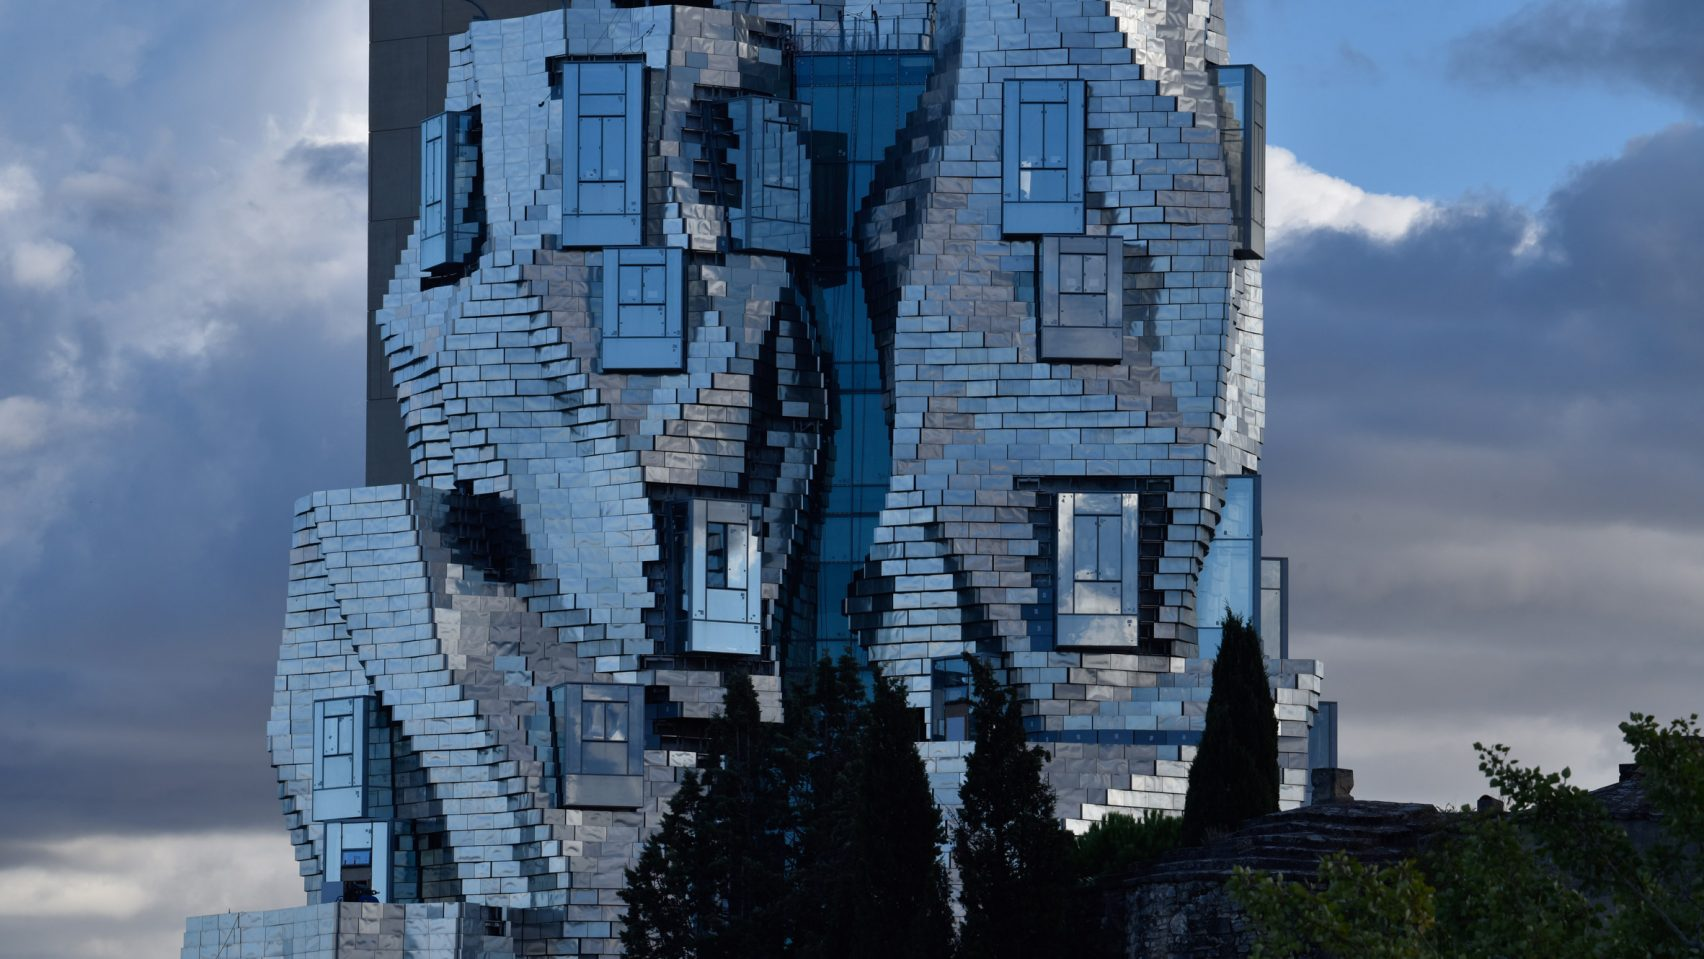 Кручёная башня от Фрэнка Гери